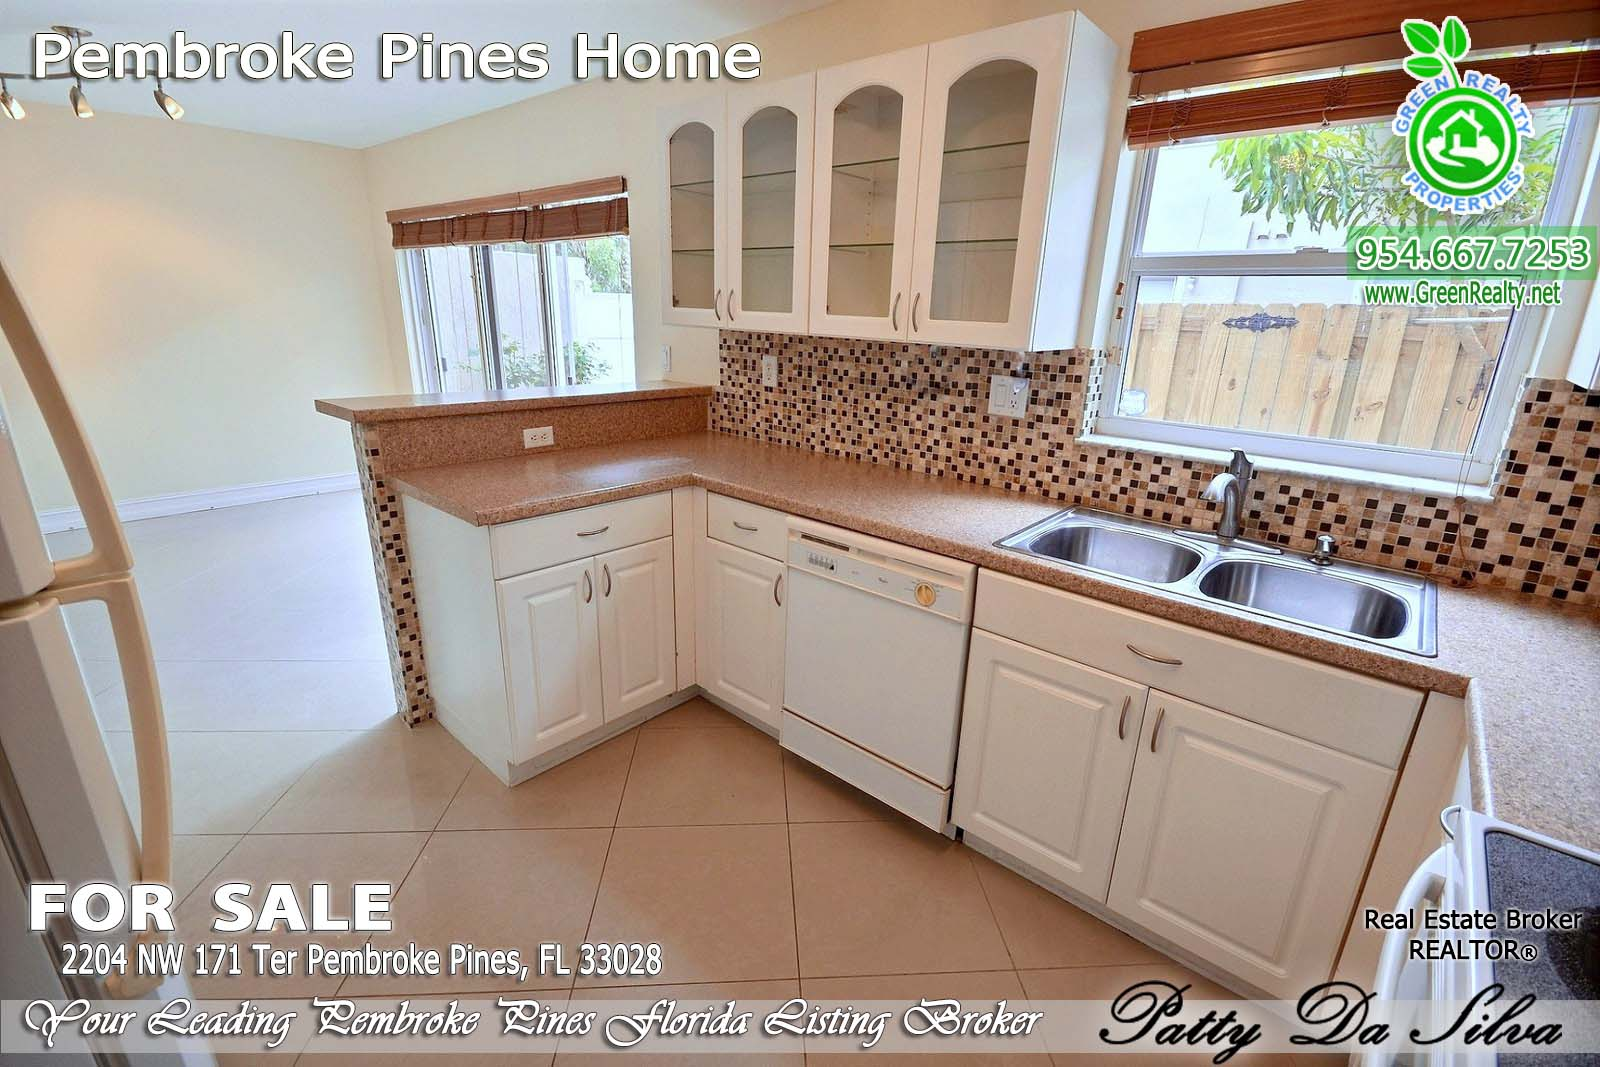 Pembroke Pines Homes For Sale - Pembroke Isles (14)